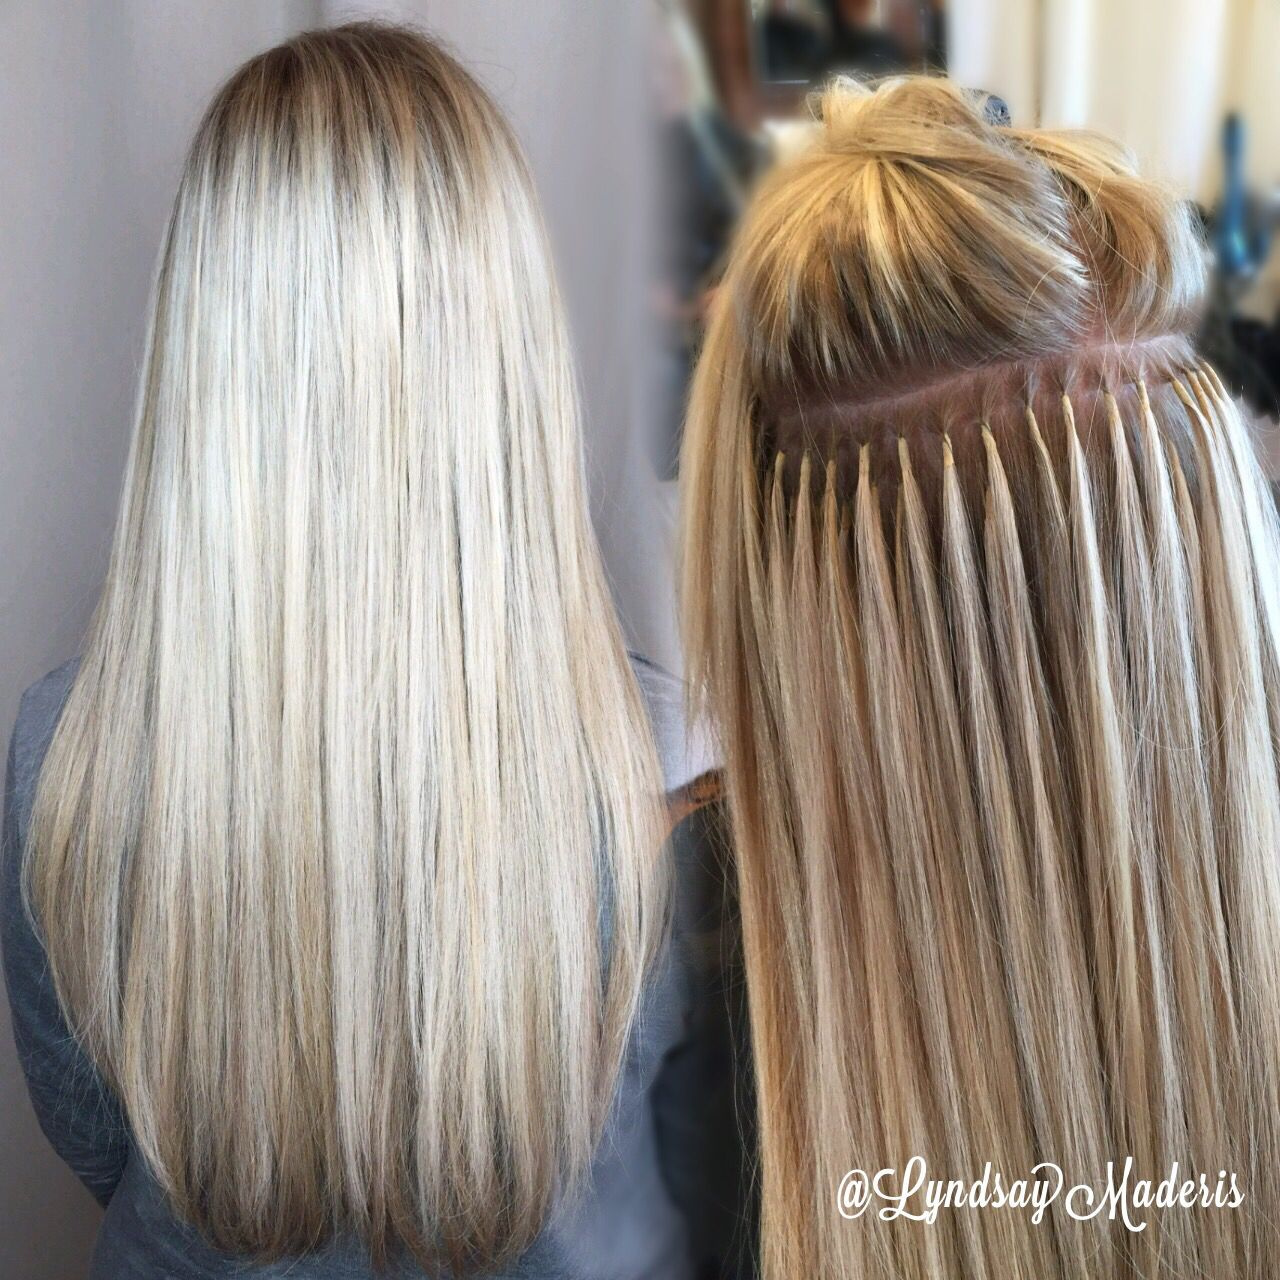 Custom keratin bonds using greatlengthsusa blonde hair extensions custom keratin bonds using greatlengthsusa blonde hair extensions pmusecretfo Image collections